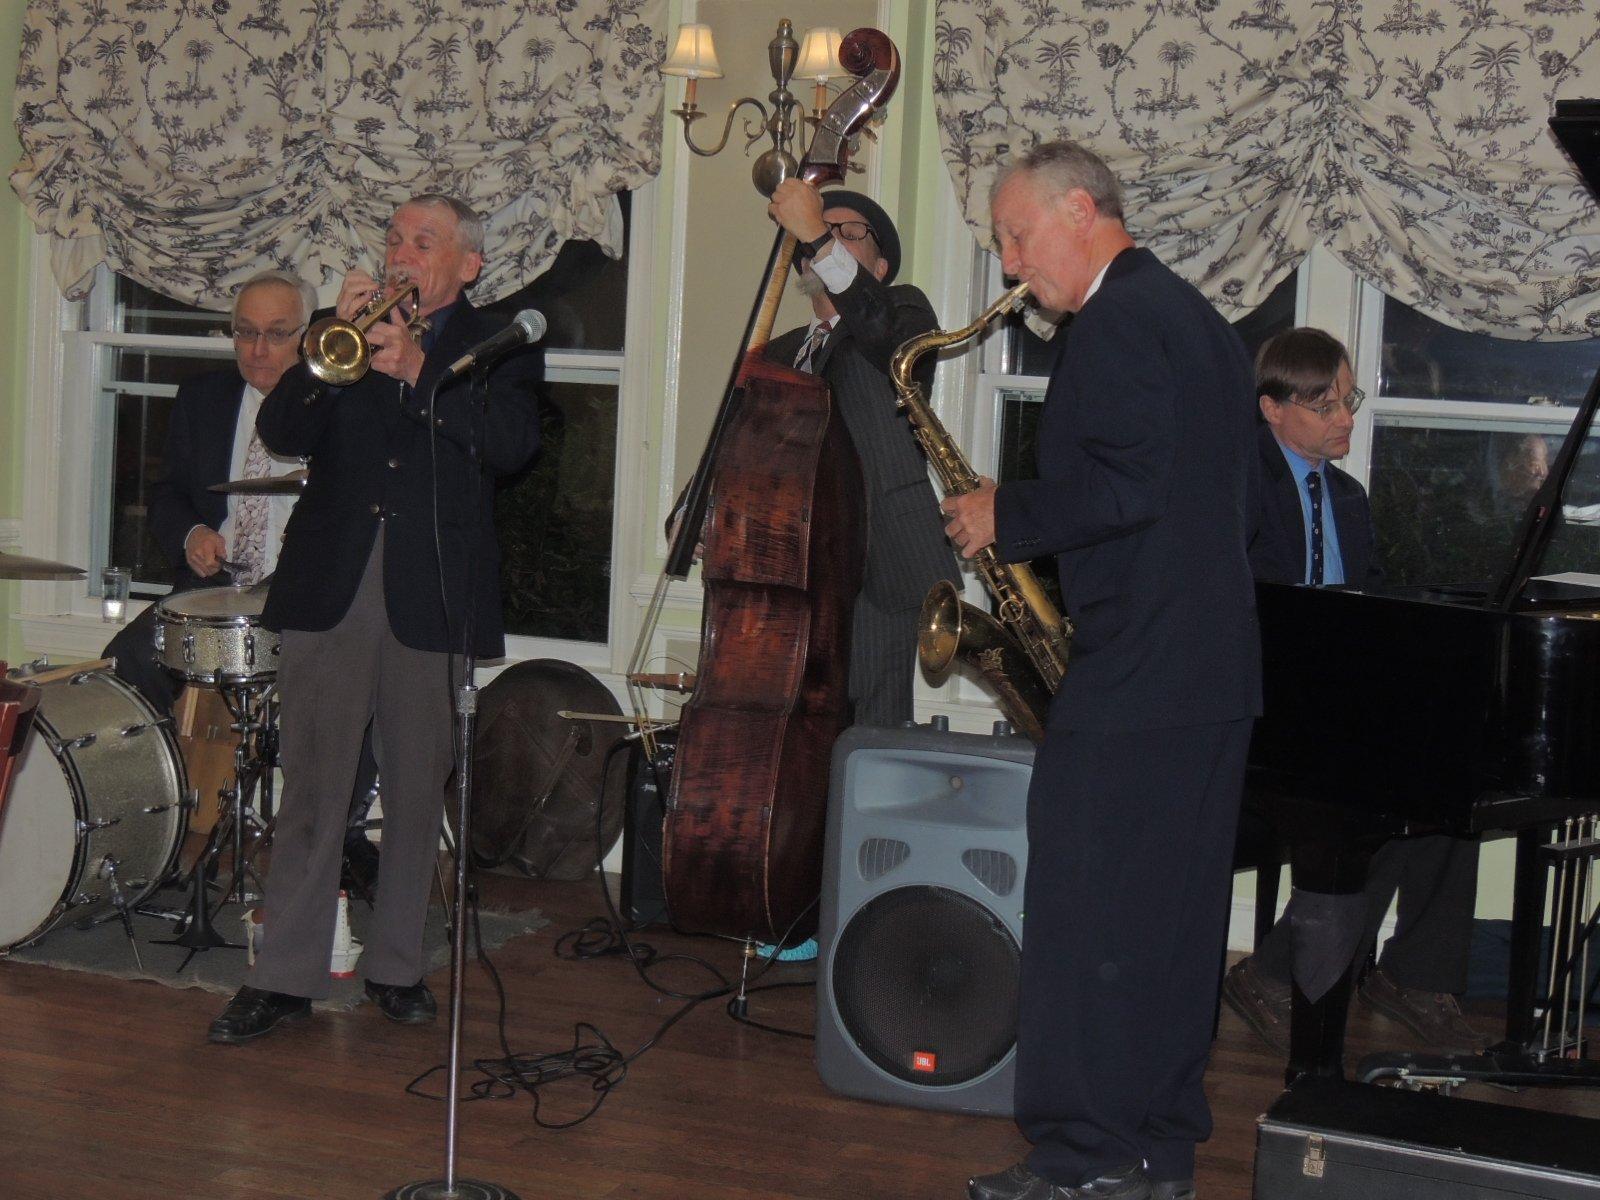 Dave Whitney trumpet, Craig Ball tenor sax/clarinet, Ken Steiner string bass, Ross Petot piano, Dave Bragdon drums.